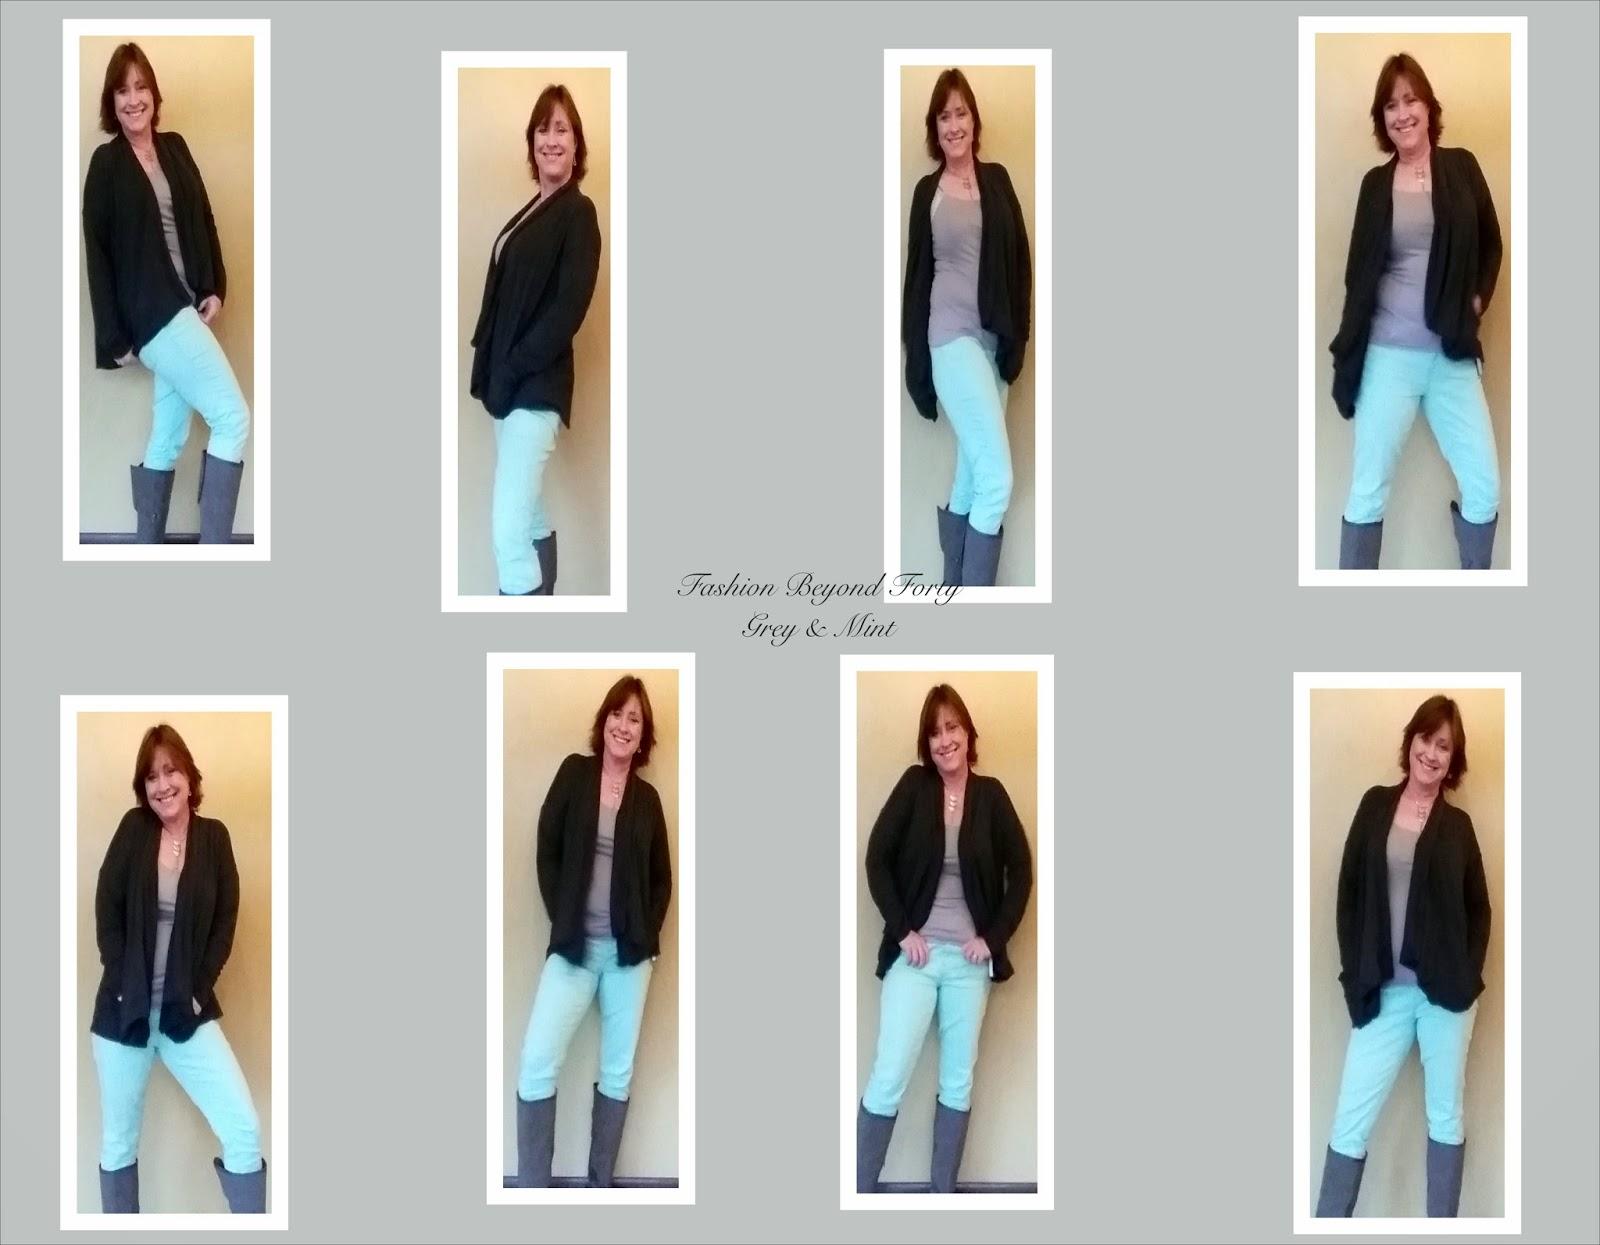 Grey and Mint Fall Fashion Fashion Beyond Forty